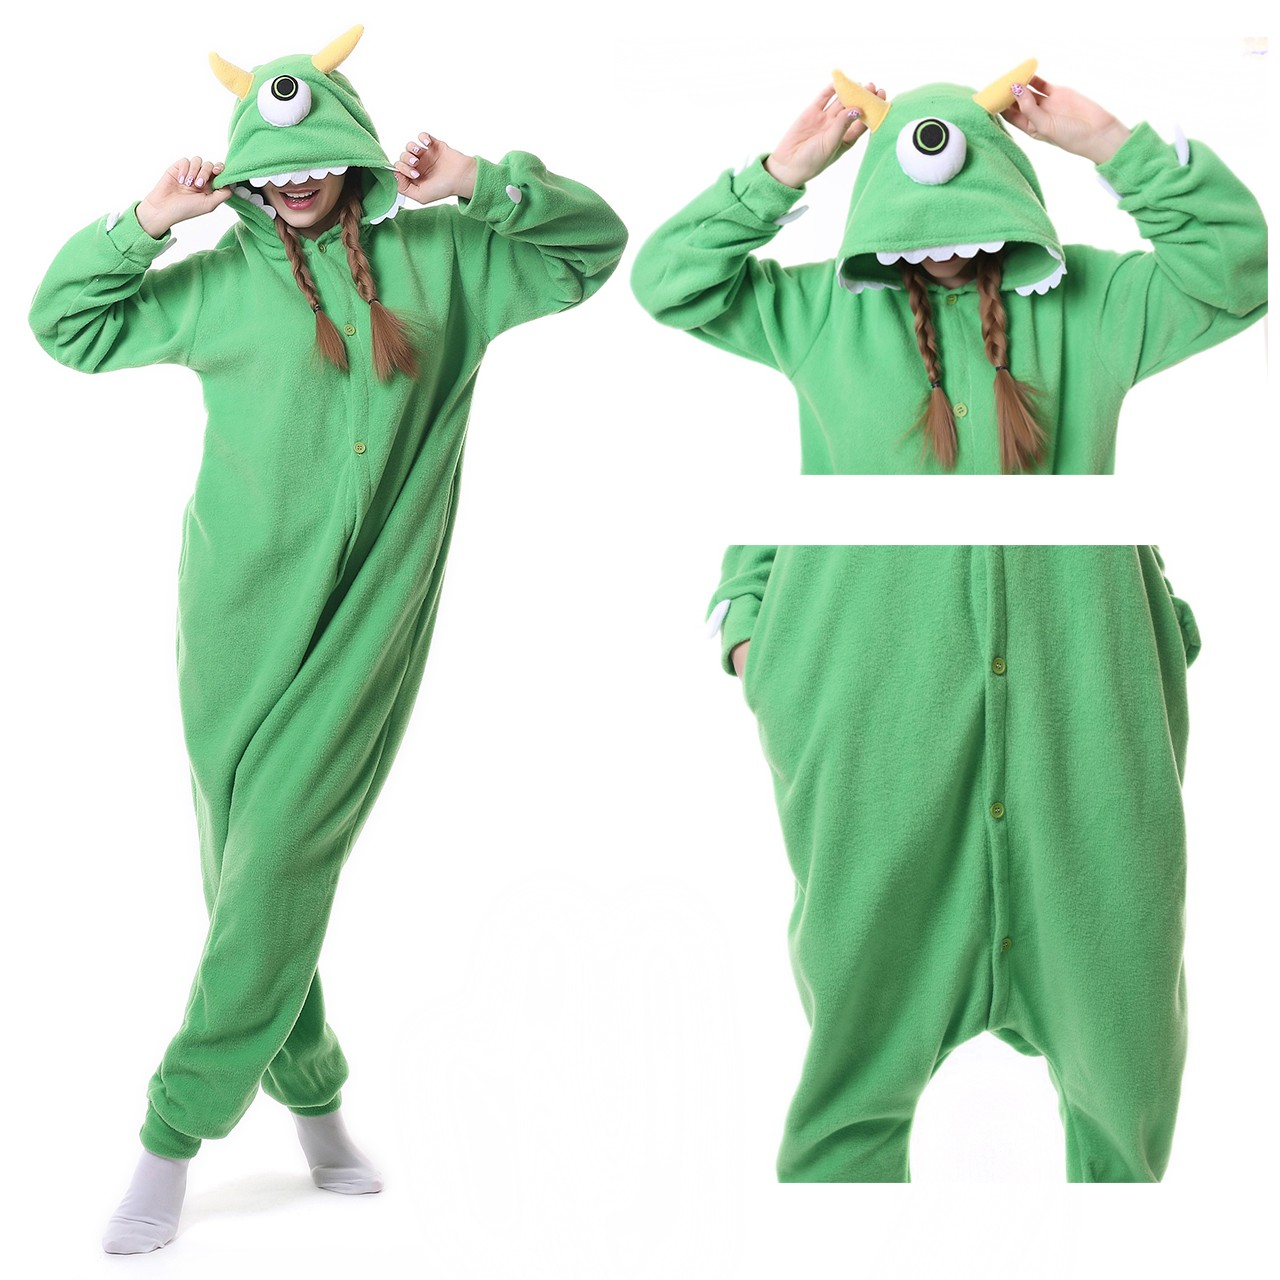 2698b50e6f2c One Eyed Monster Disney Onesie Kigurumi Cartoon Pajama for adult Monsters  Inc Costumes